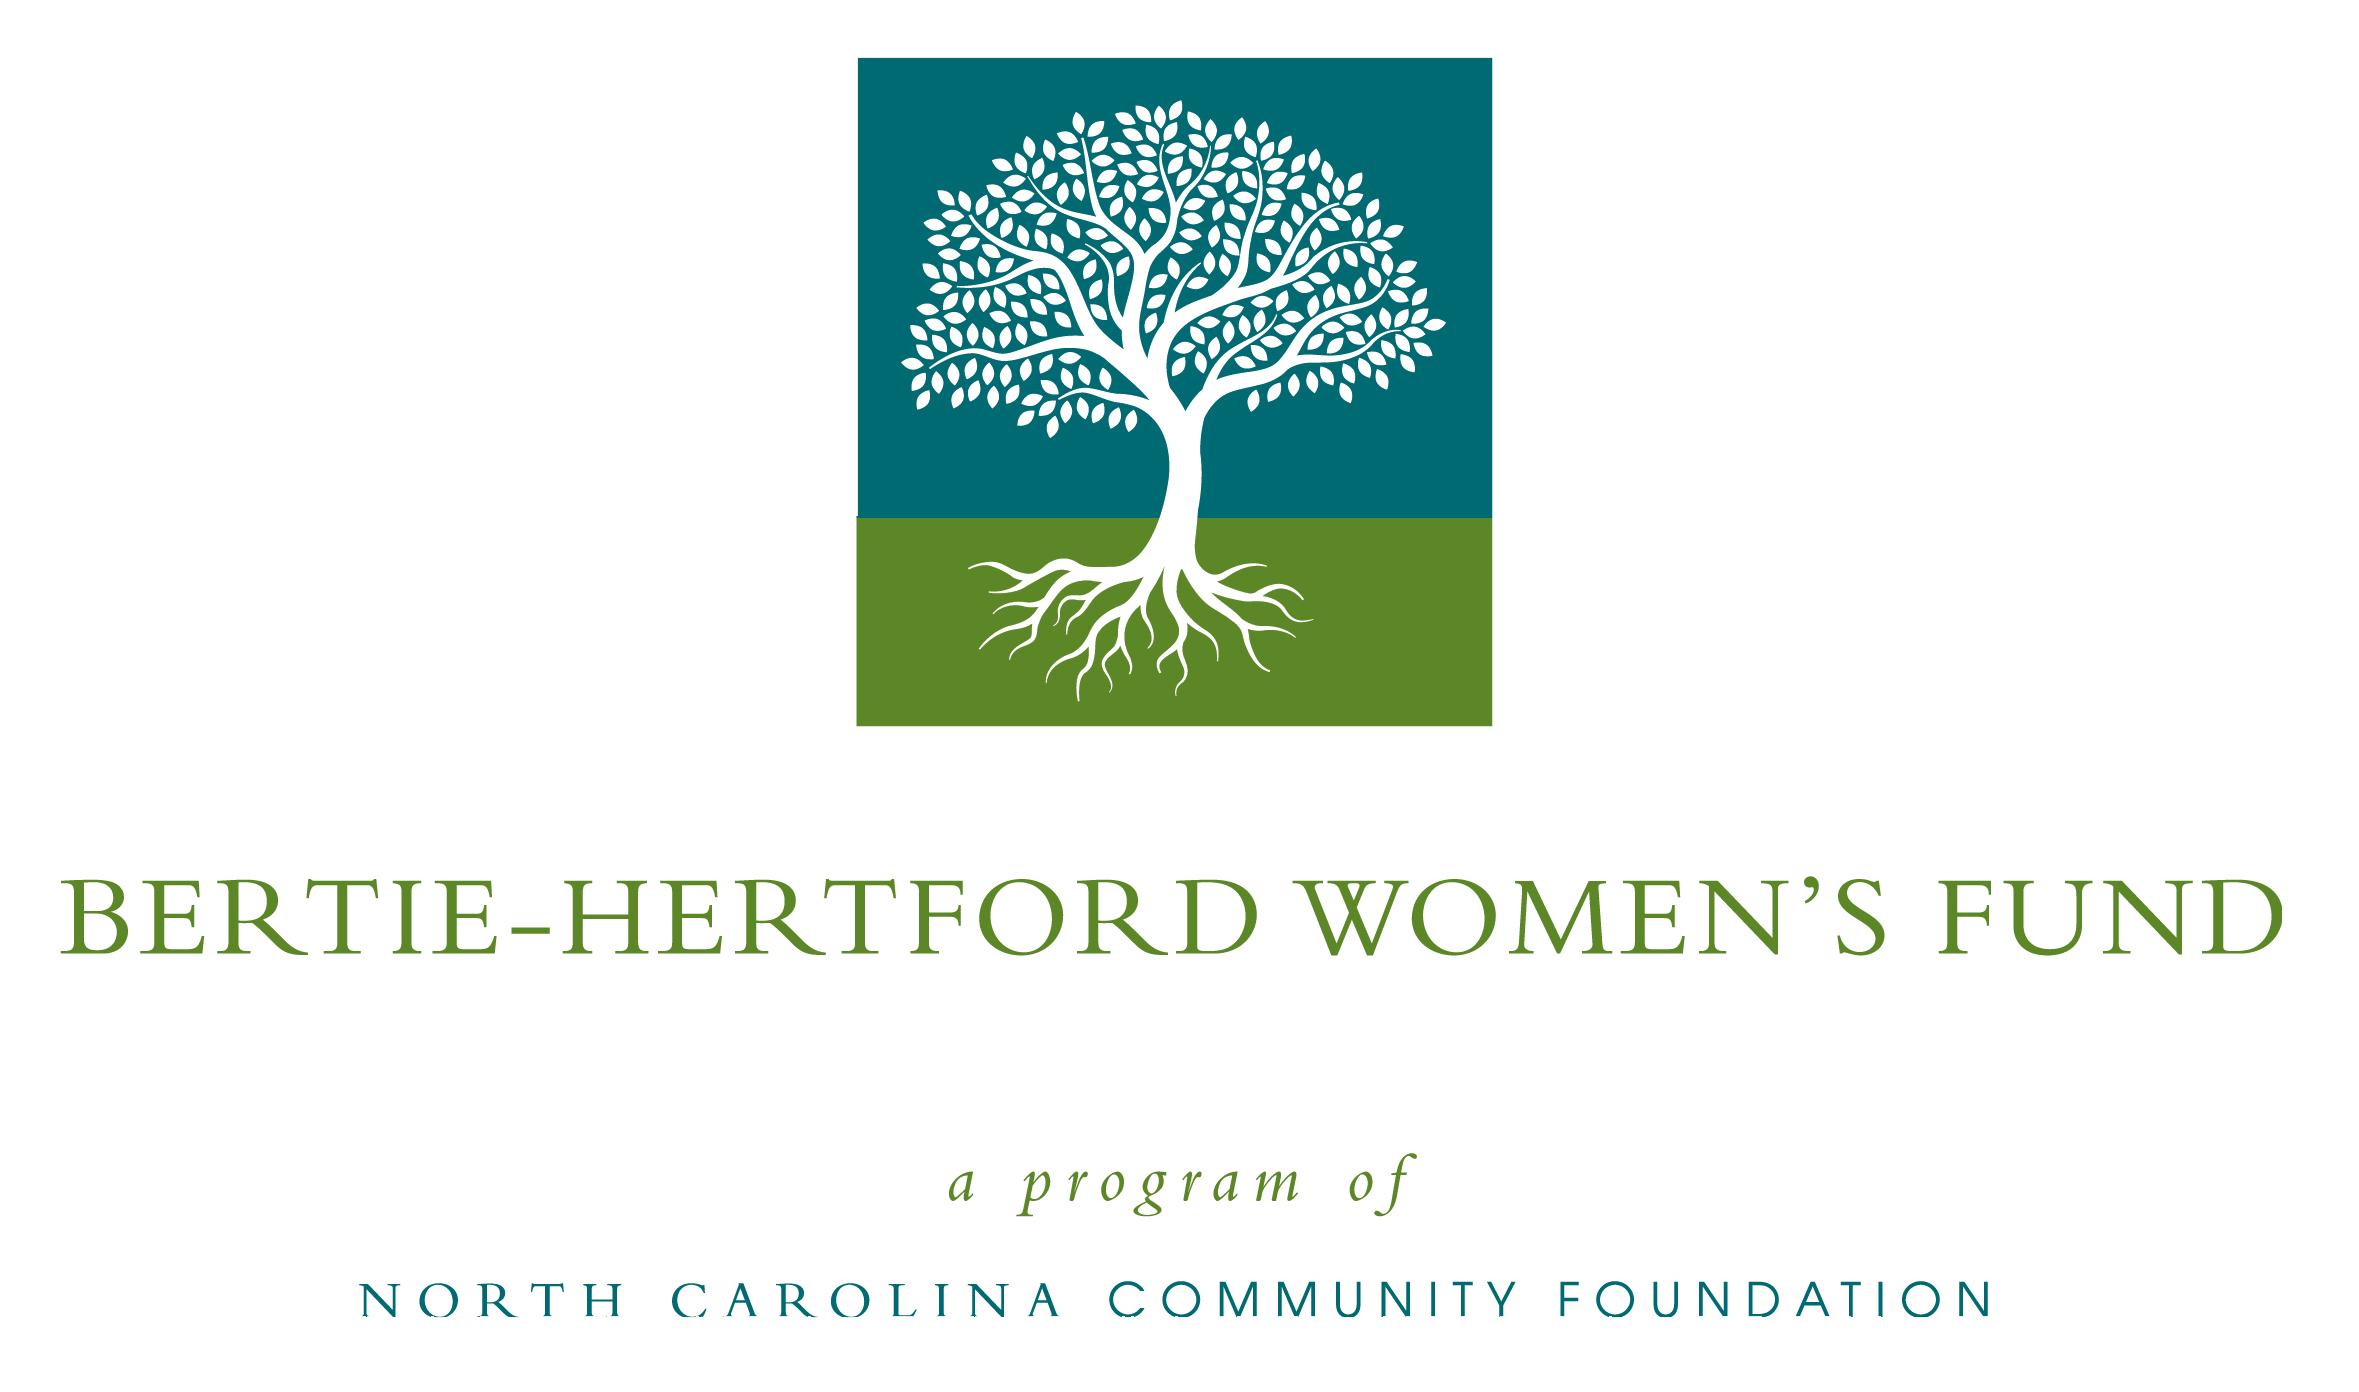 Bertie-Hertford Women's Fund